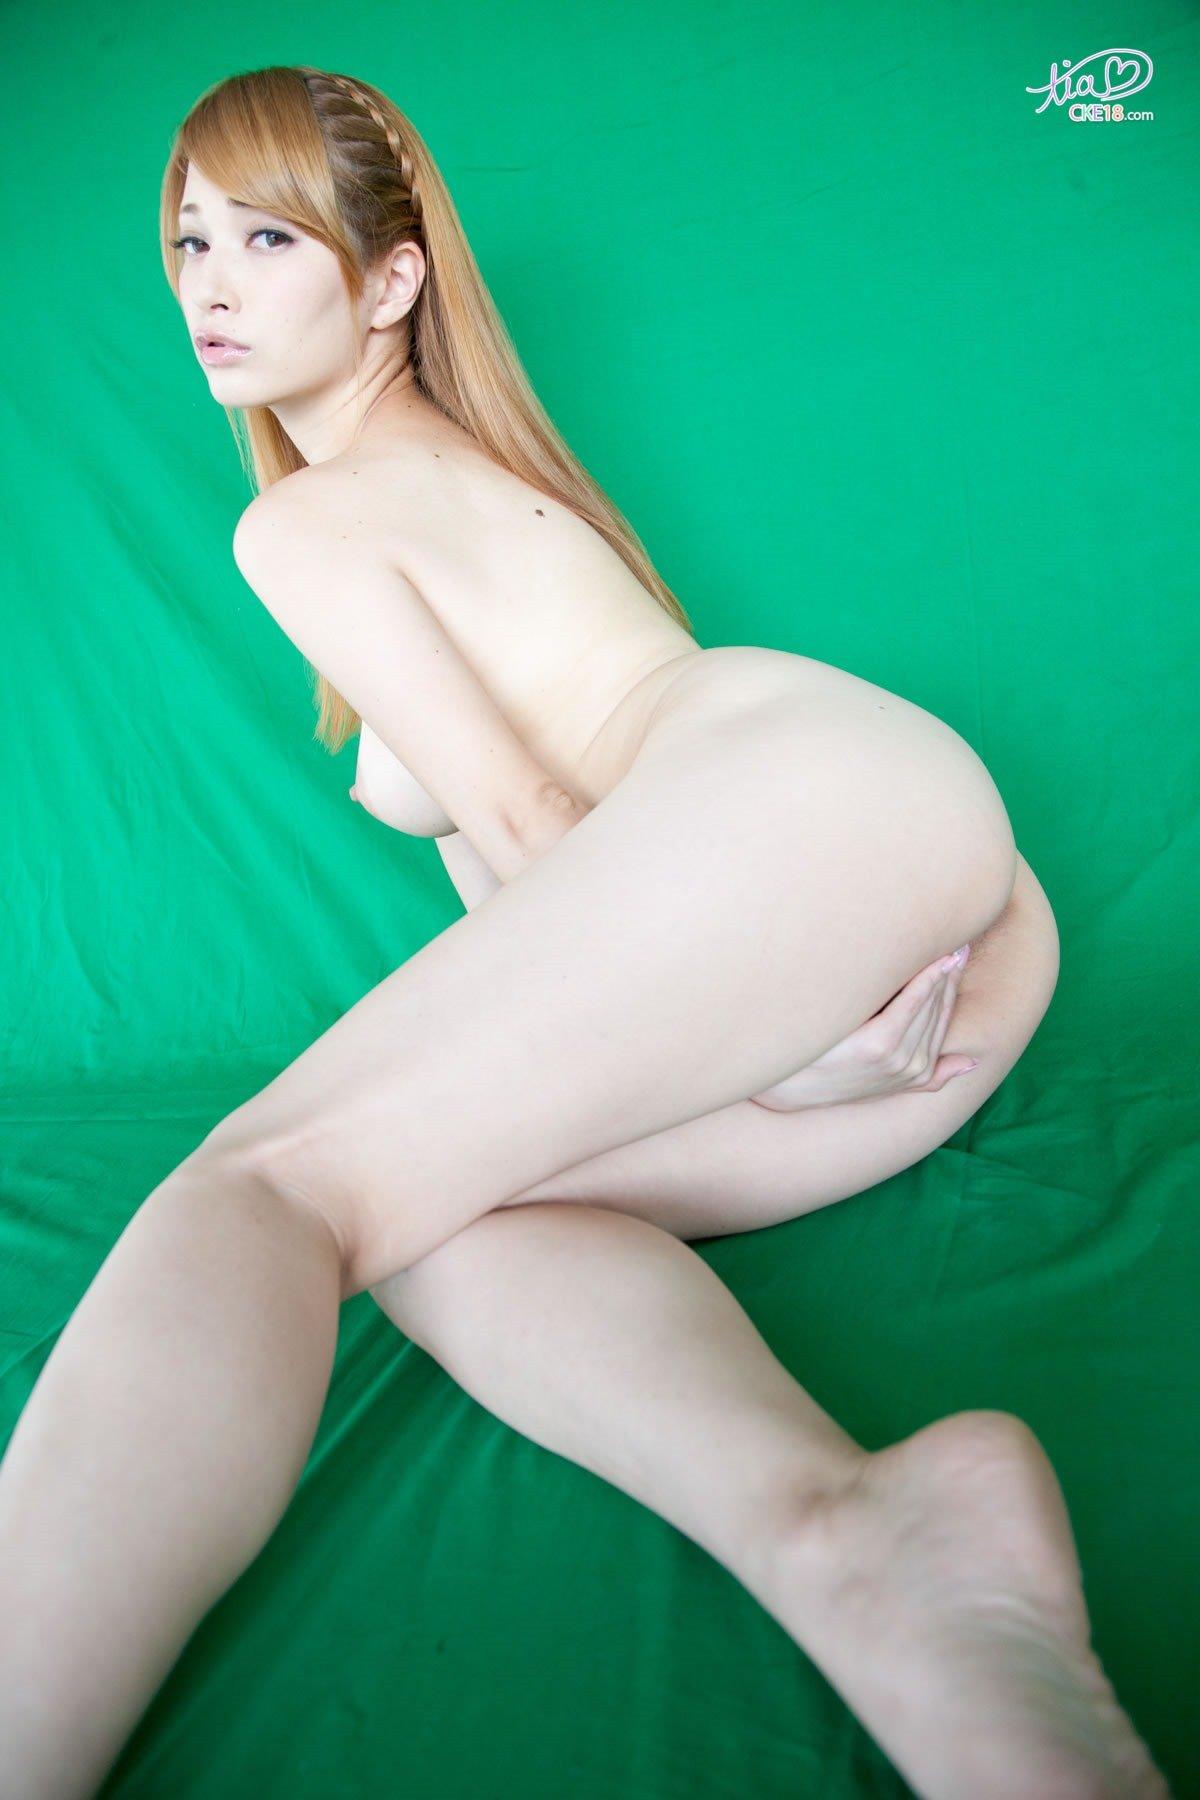 Chinese girl fucking woman